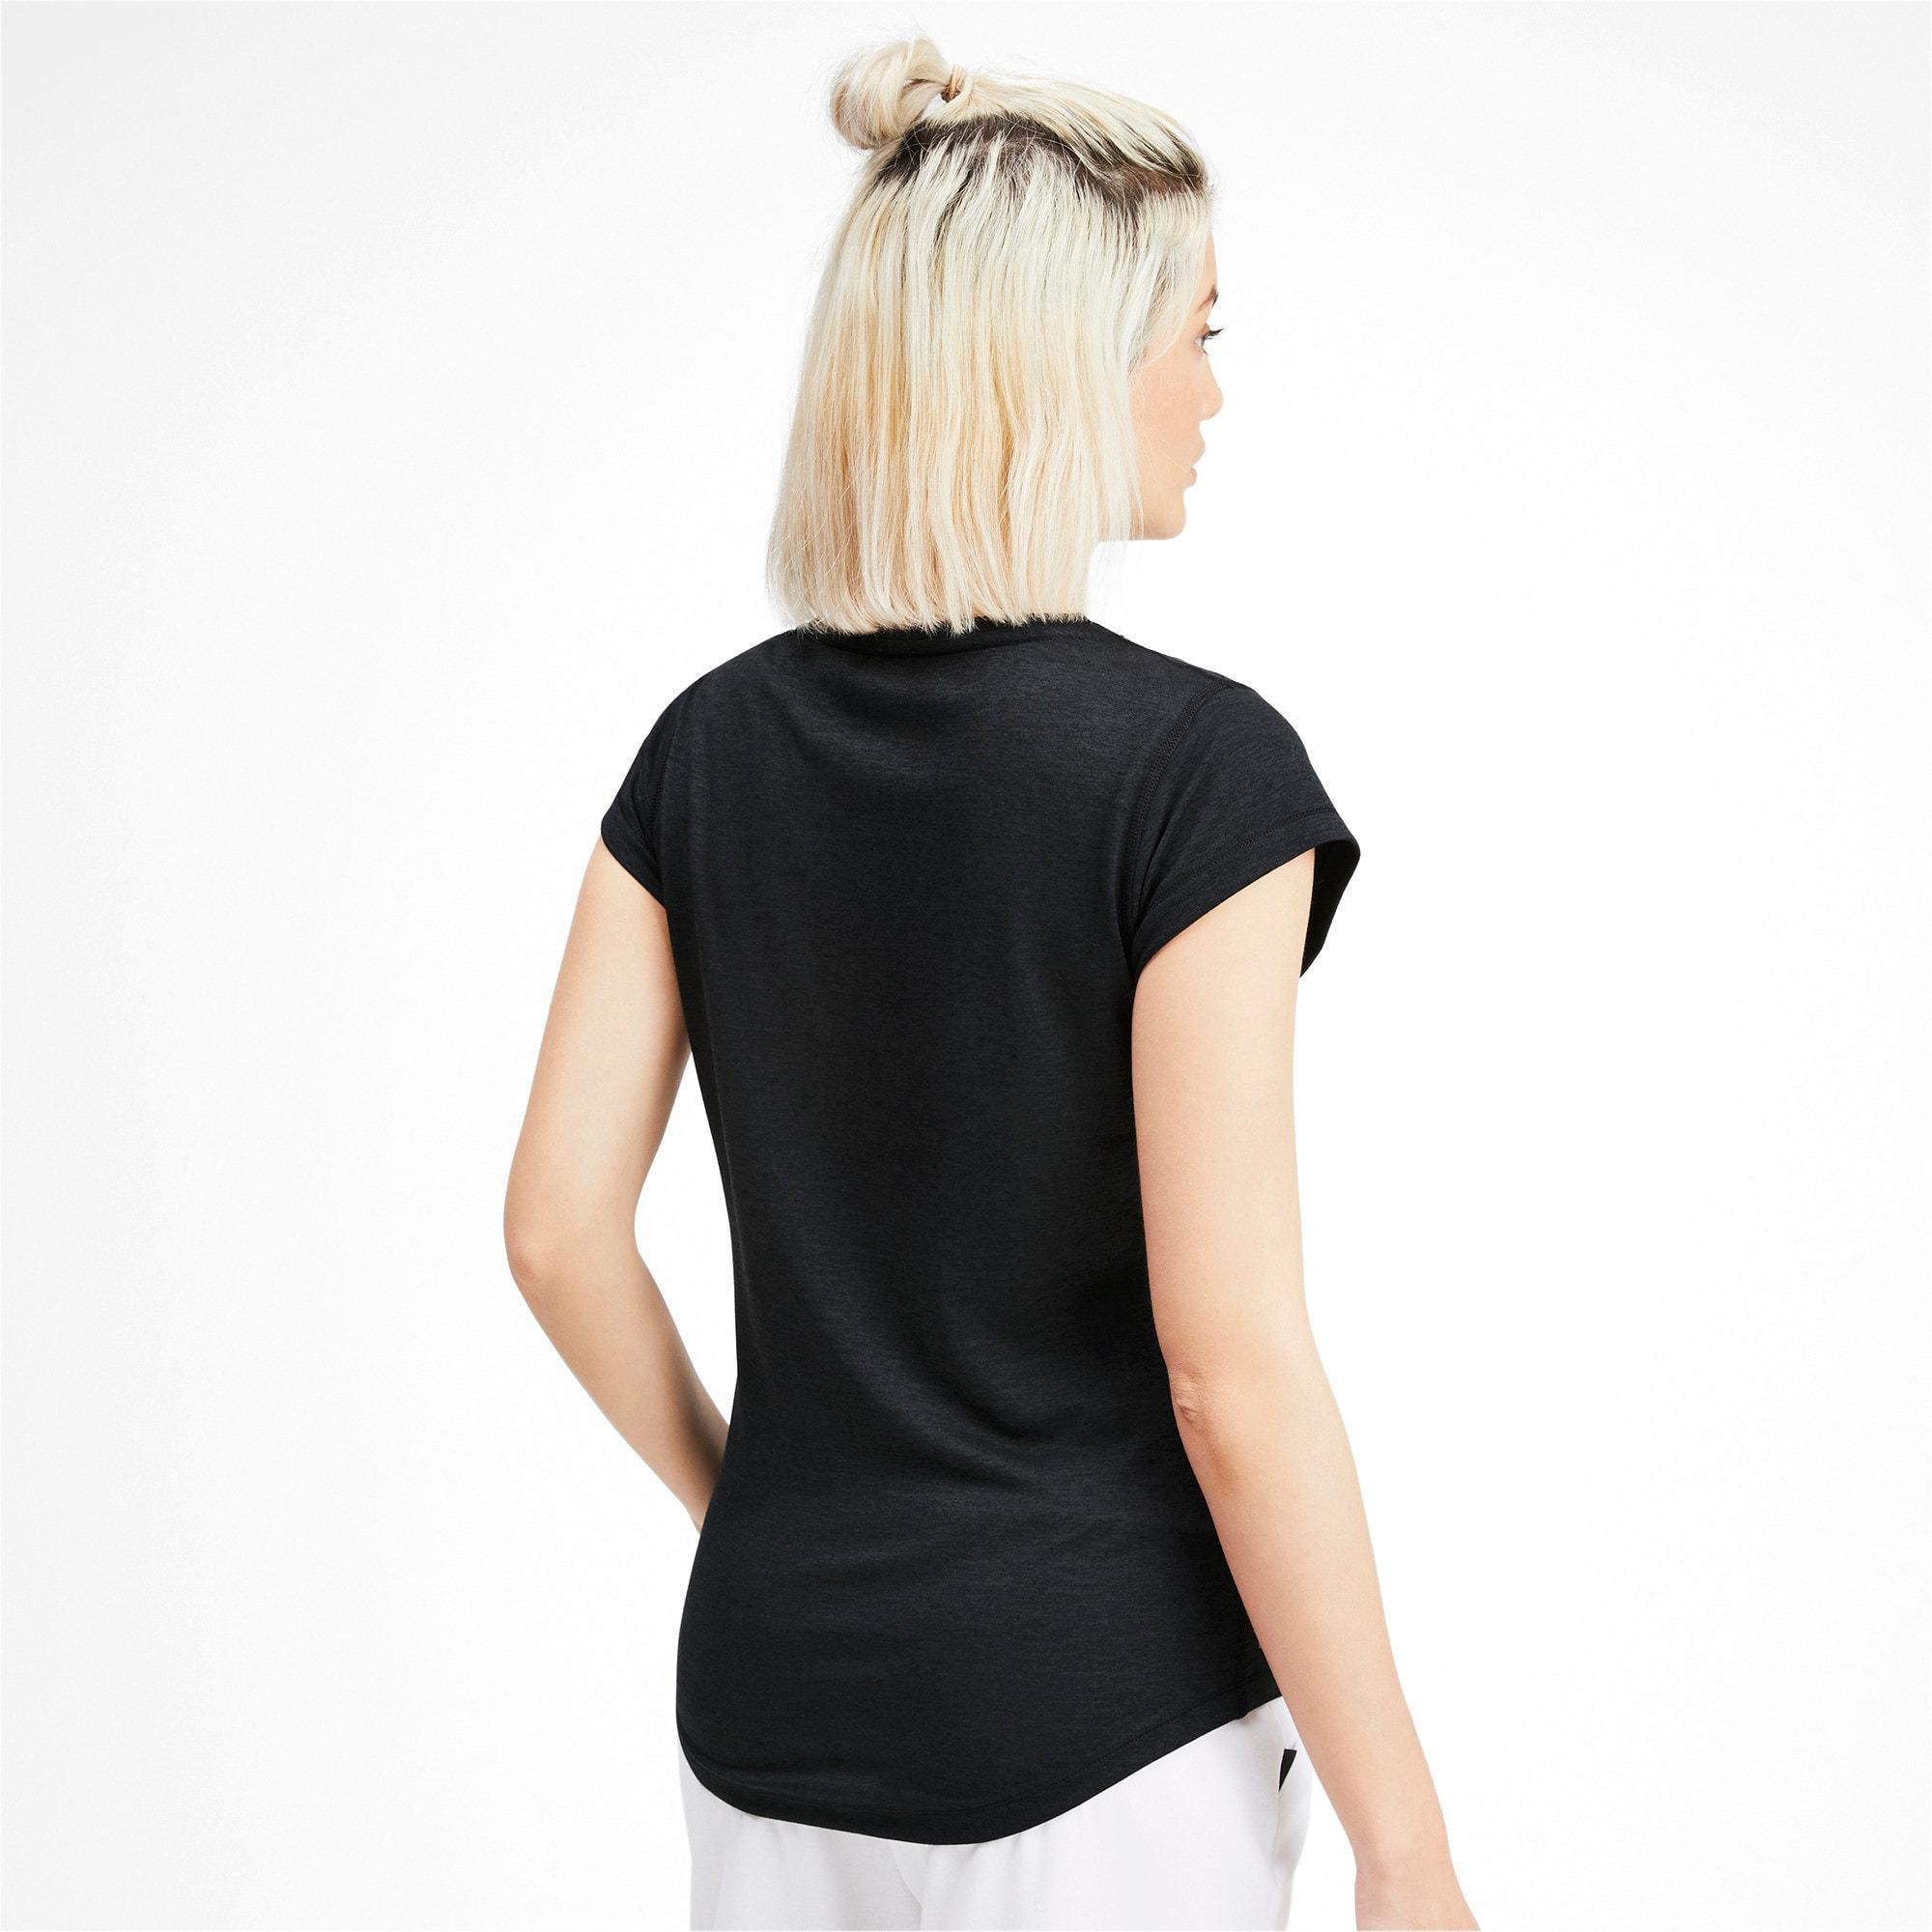 Thumbnail 2 of ヘザー キャット ウィメンズ ランニング Tシャツ 半袖, Puma Black, medium-JPN